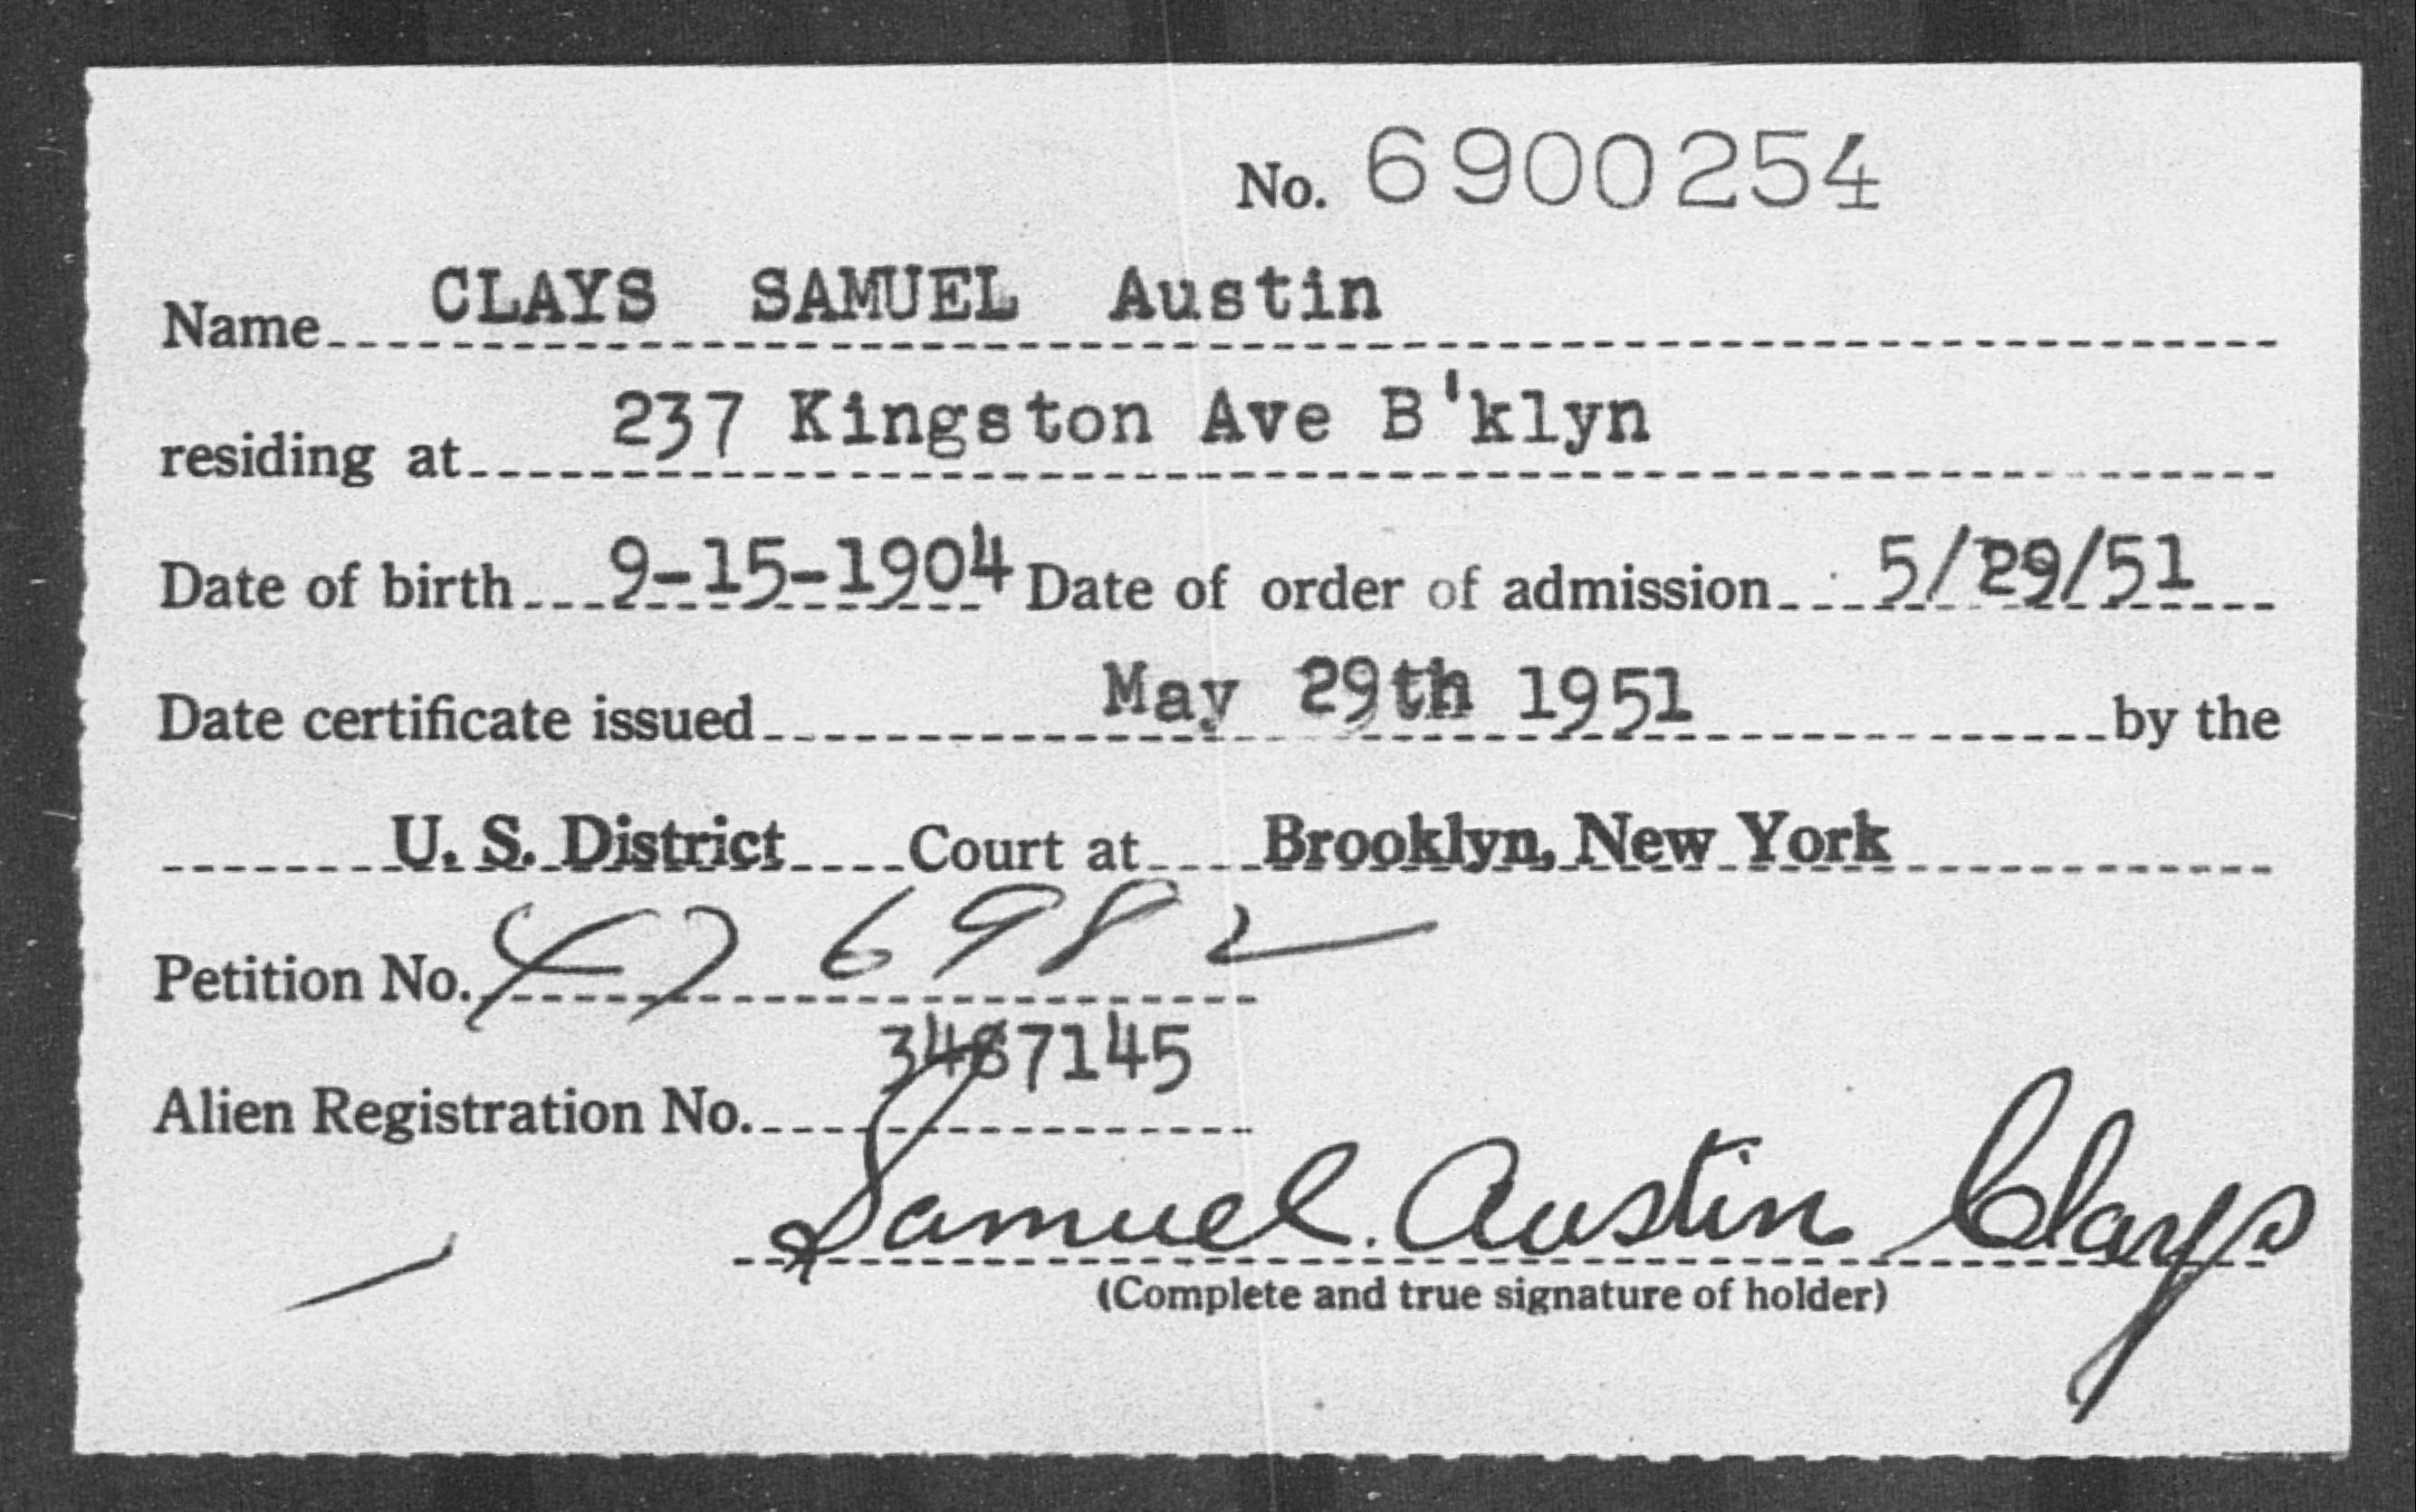 CLAYS SAMUEL Austin - Born: 1904, Naturalized: 1951